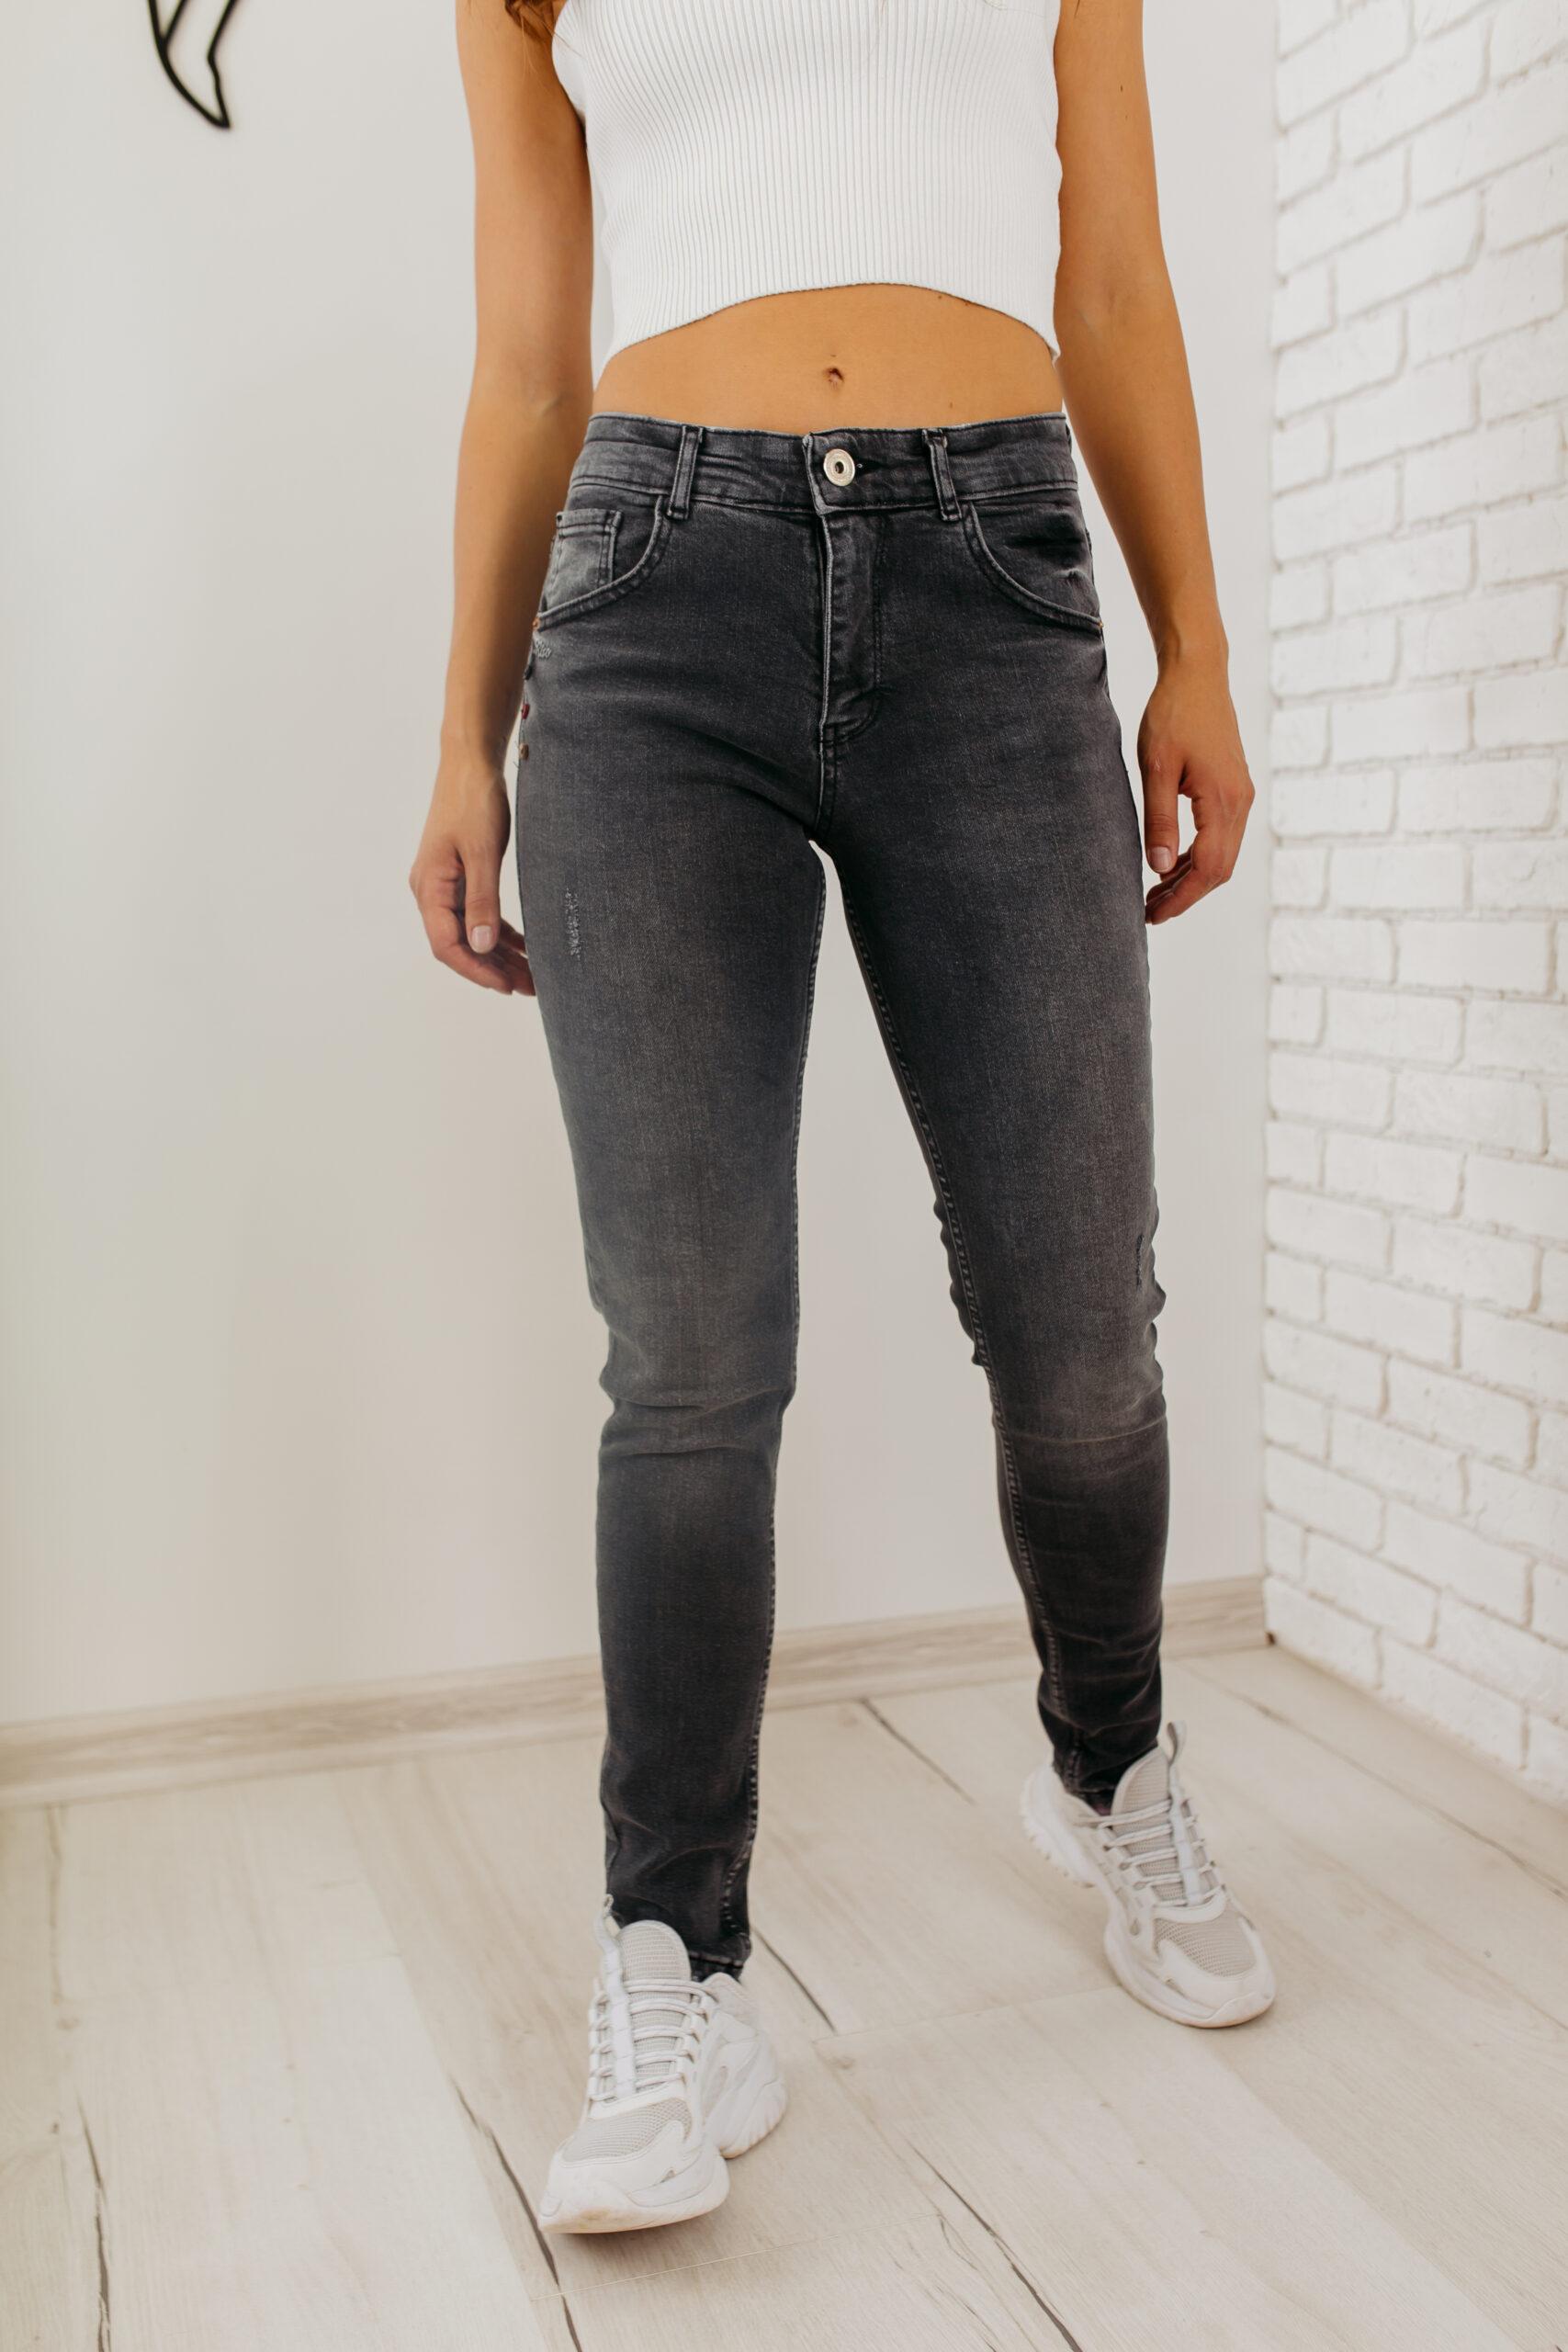 Женские джинсы МОМ Woox 1051-1